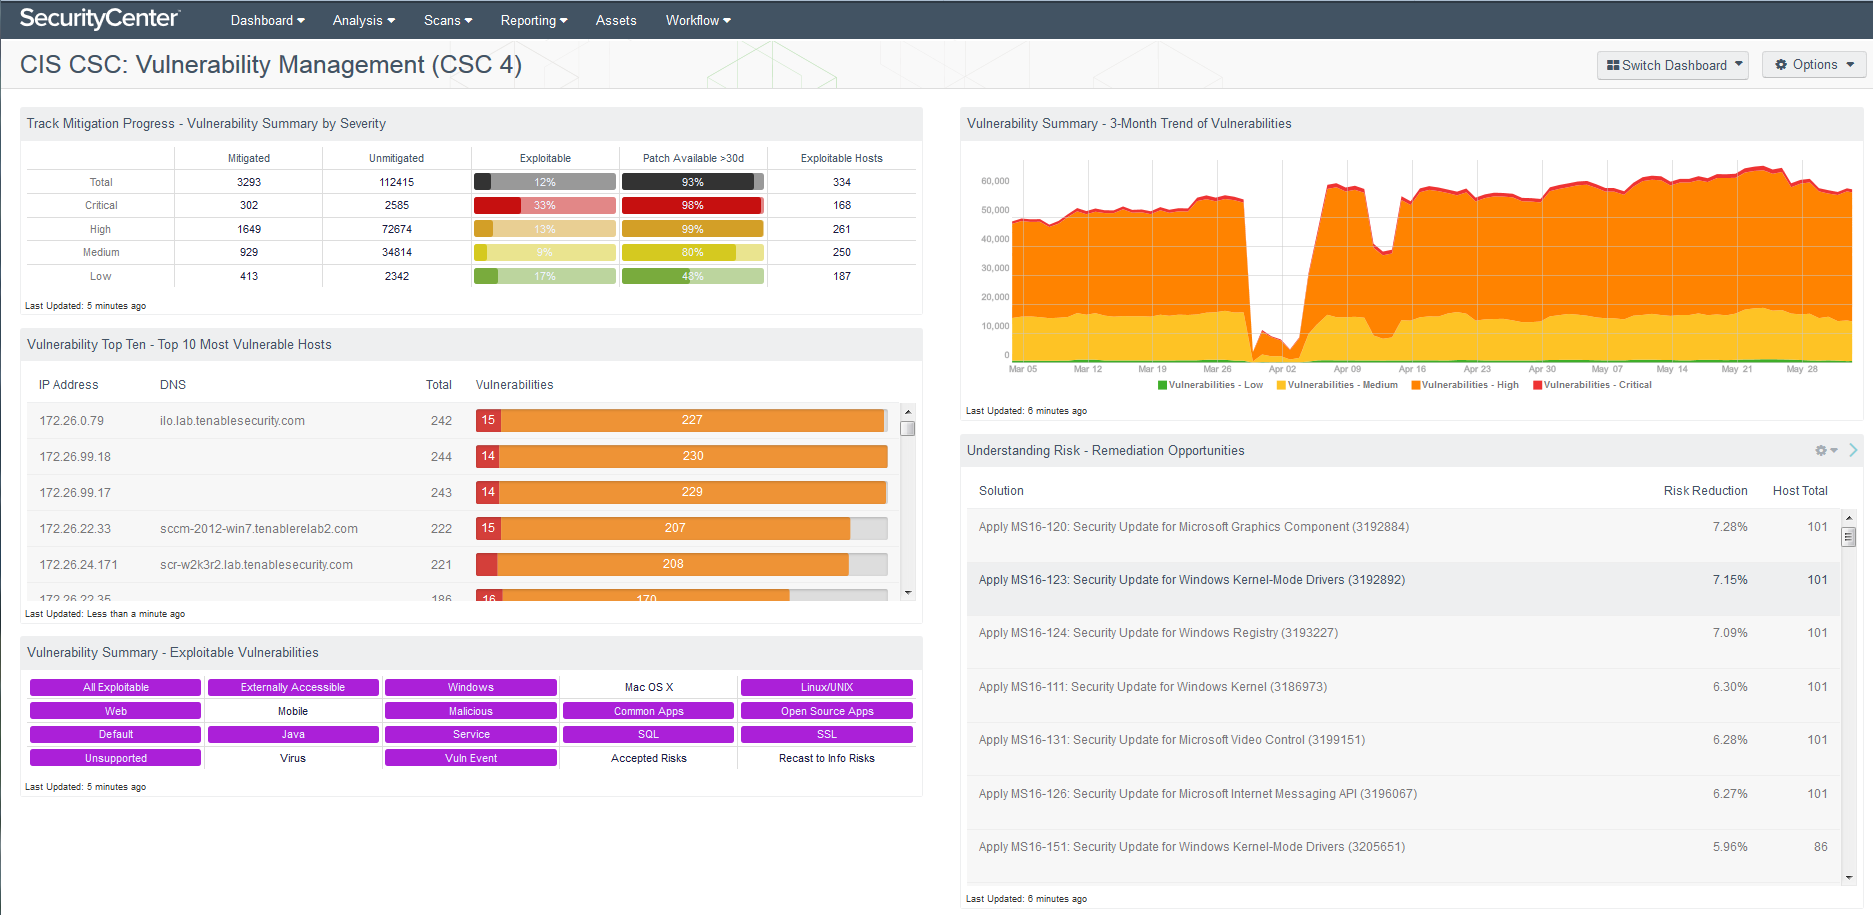 CIS CSC: Vulnerability Management (CSC 4) dashboard